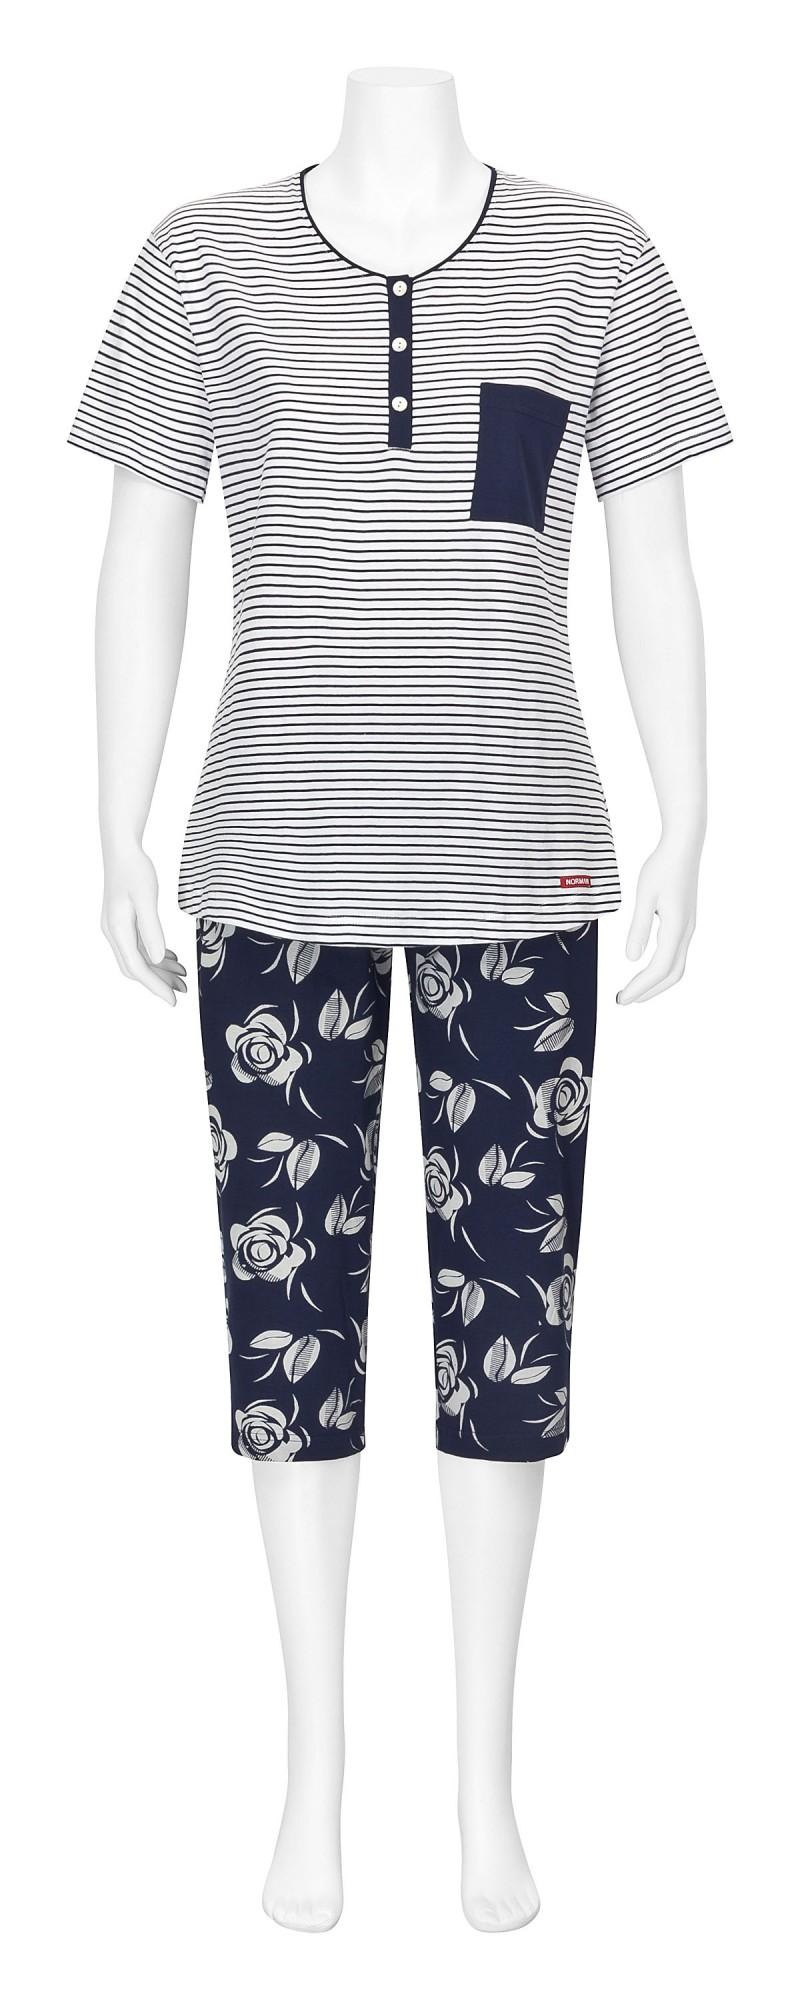 Damen Capri-Pyjama kurzarm – auch Grösse 32/34 und Übergrösse bis 60/62  - 204 90 881 – Bild 2